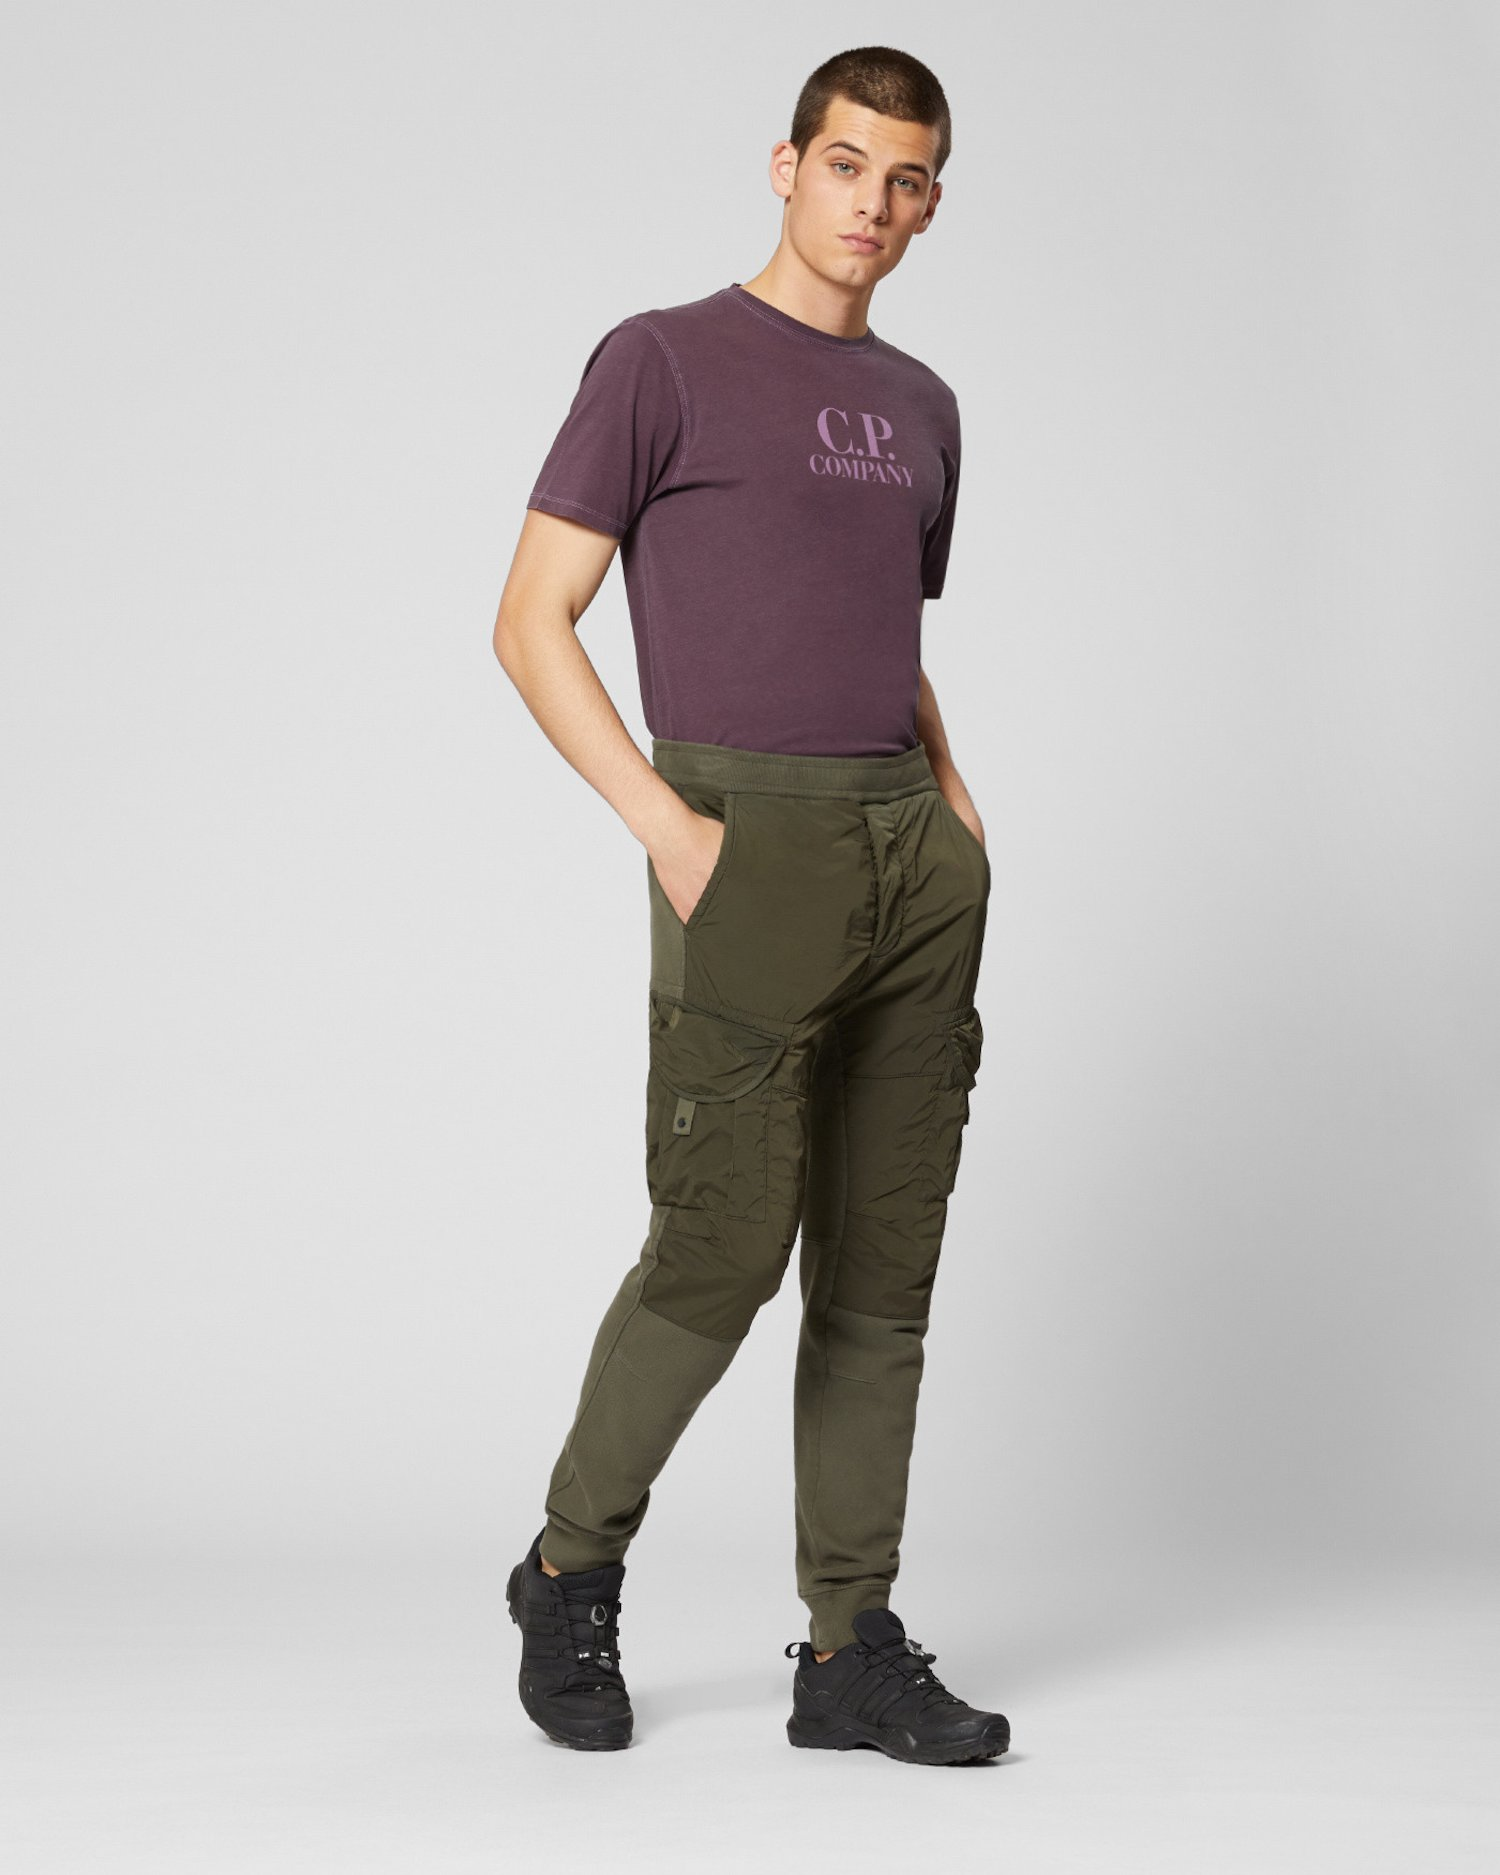 Pantalones de deporte de mezcla de tejido polar cepillado teñido en prenda con lente